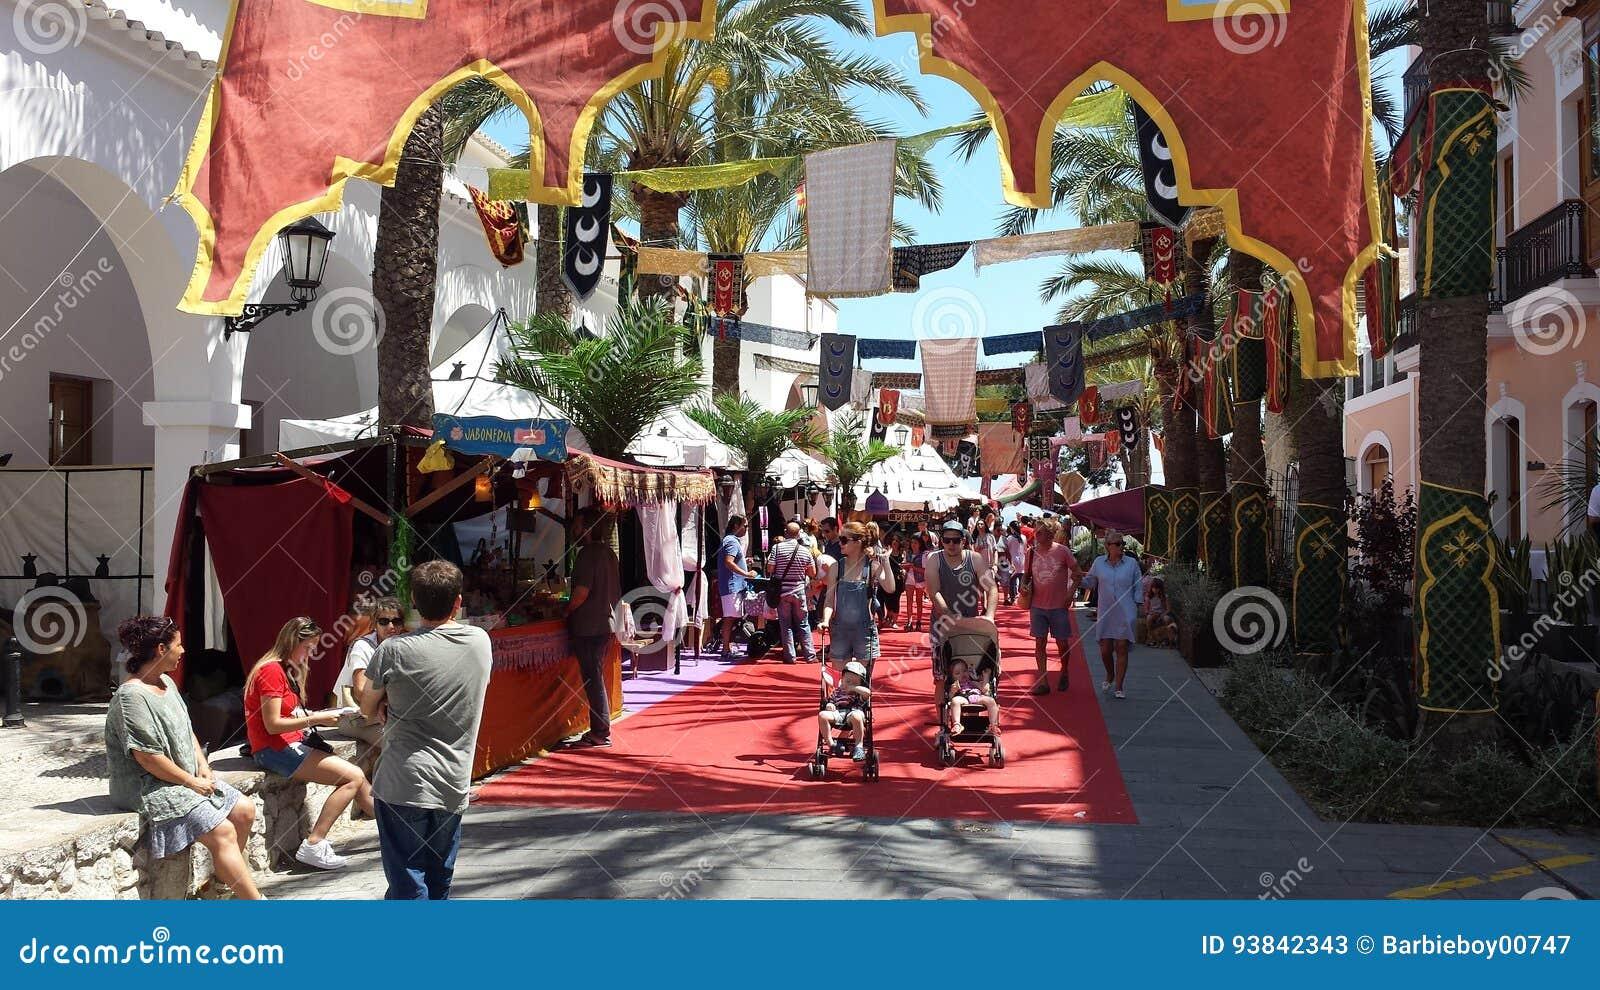 arab markets ibiza spain editorial stock photo. image of europe